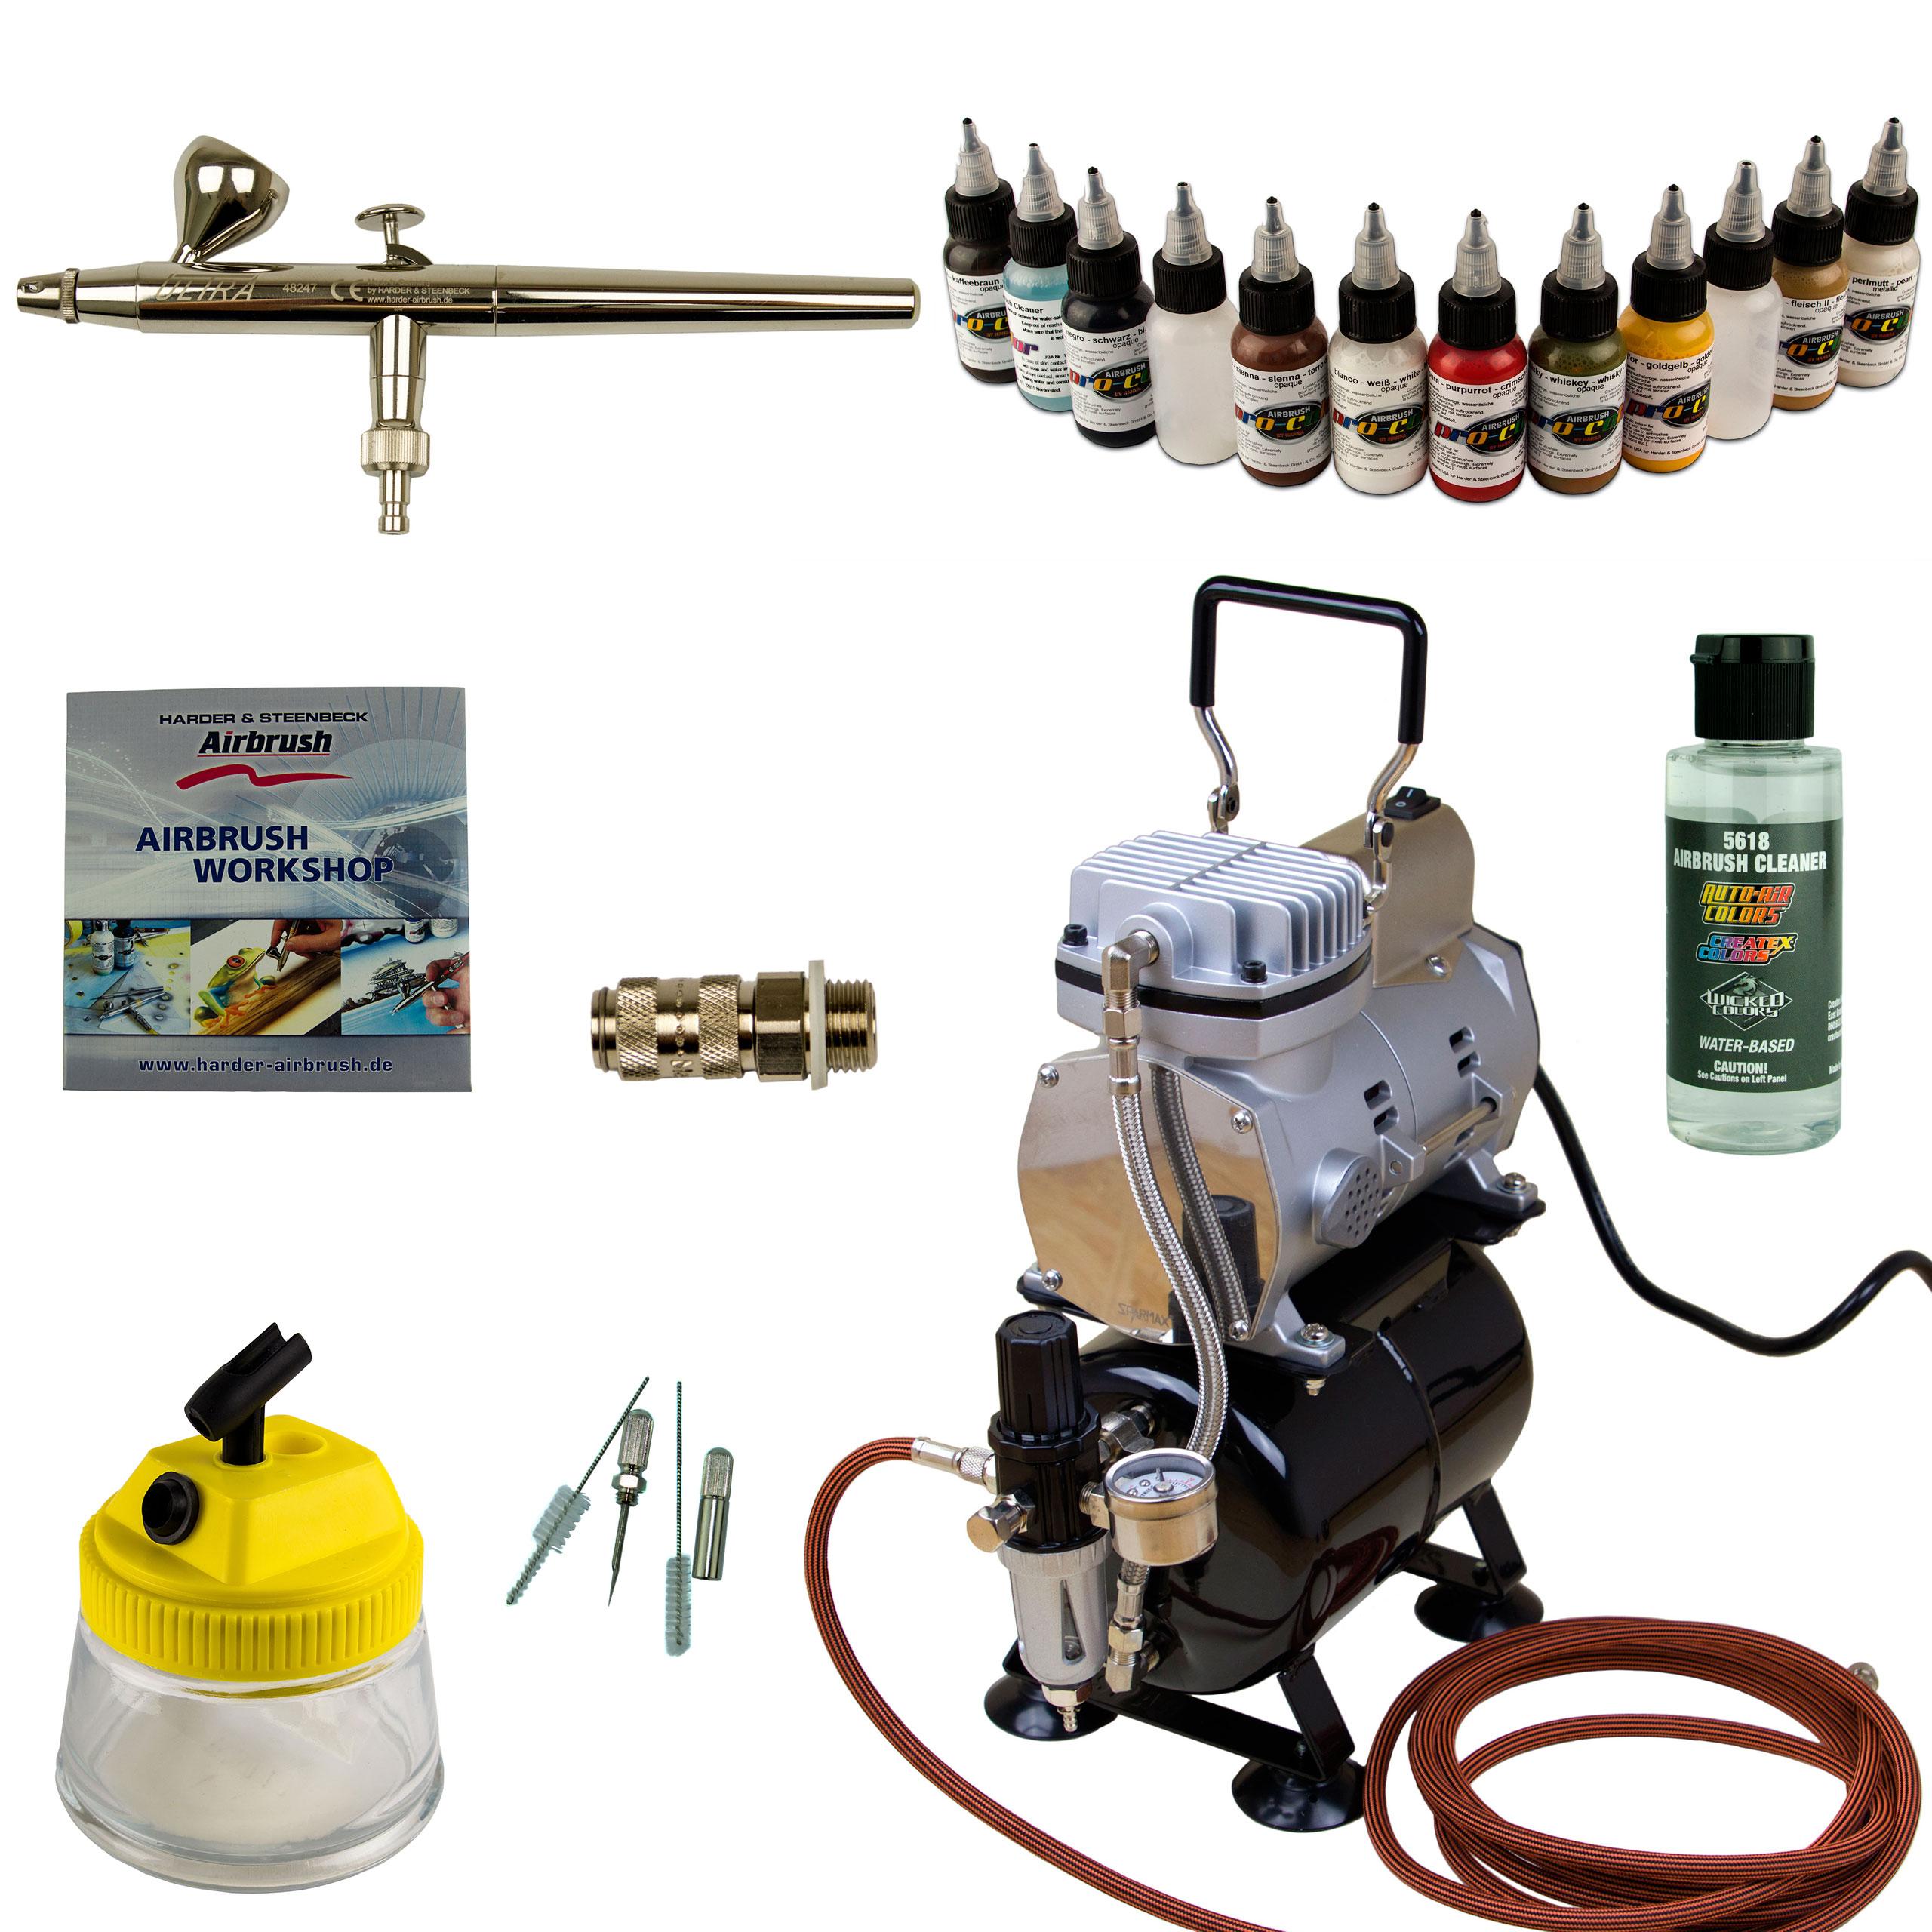 Modellbau Airbrush Set - Ultra Airbrushpistole - Sparmax TC-610H-n Kompressor - Kit 9009